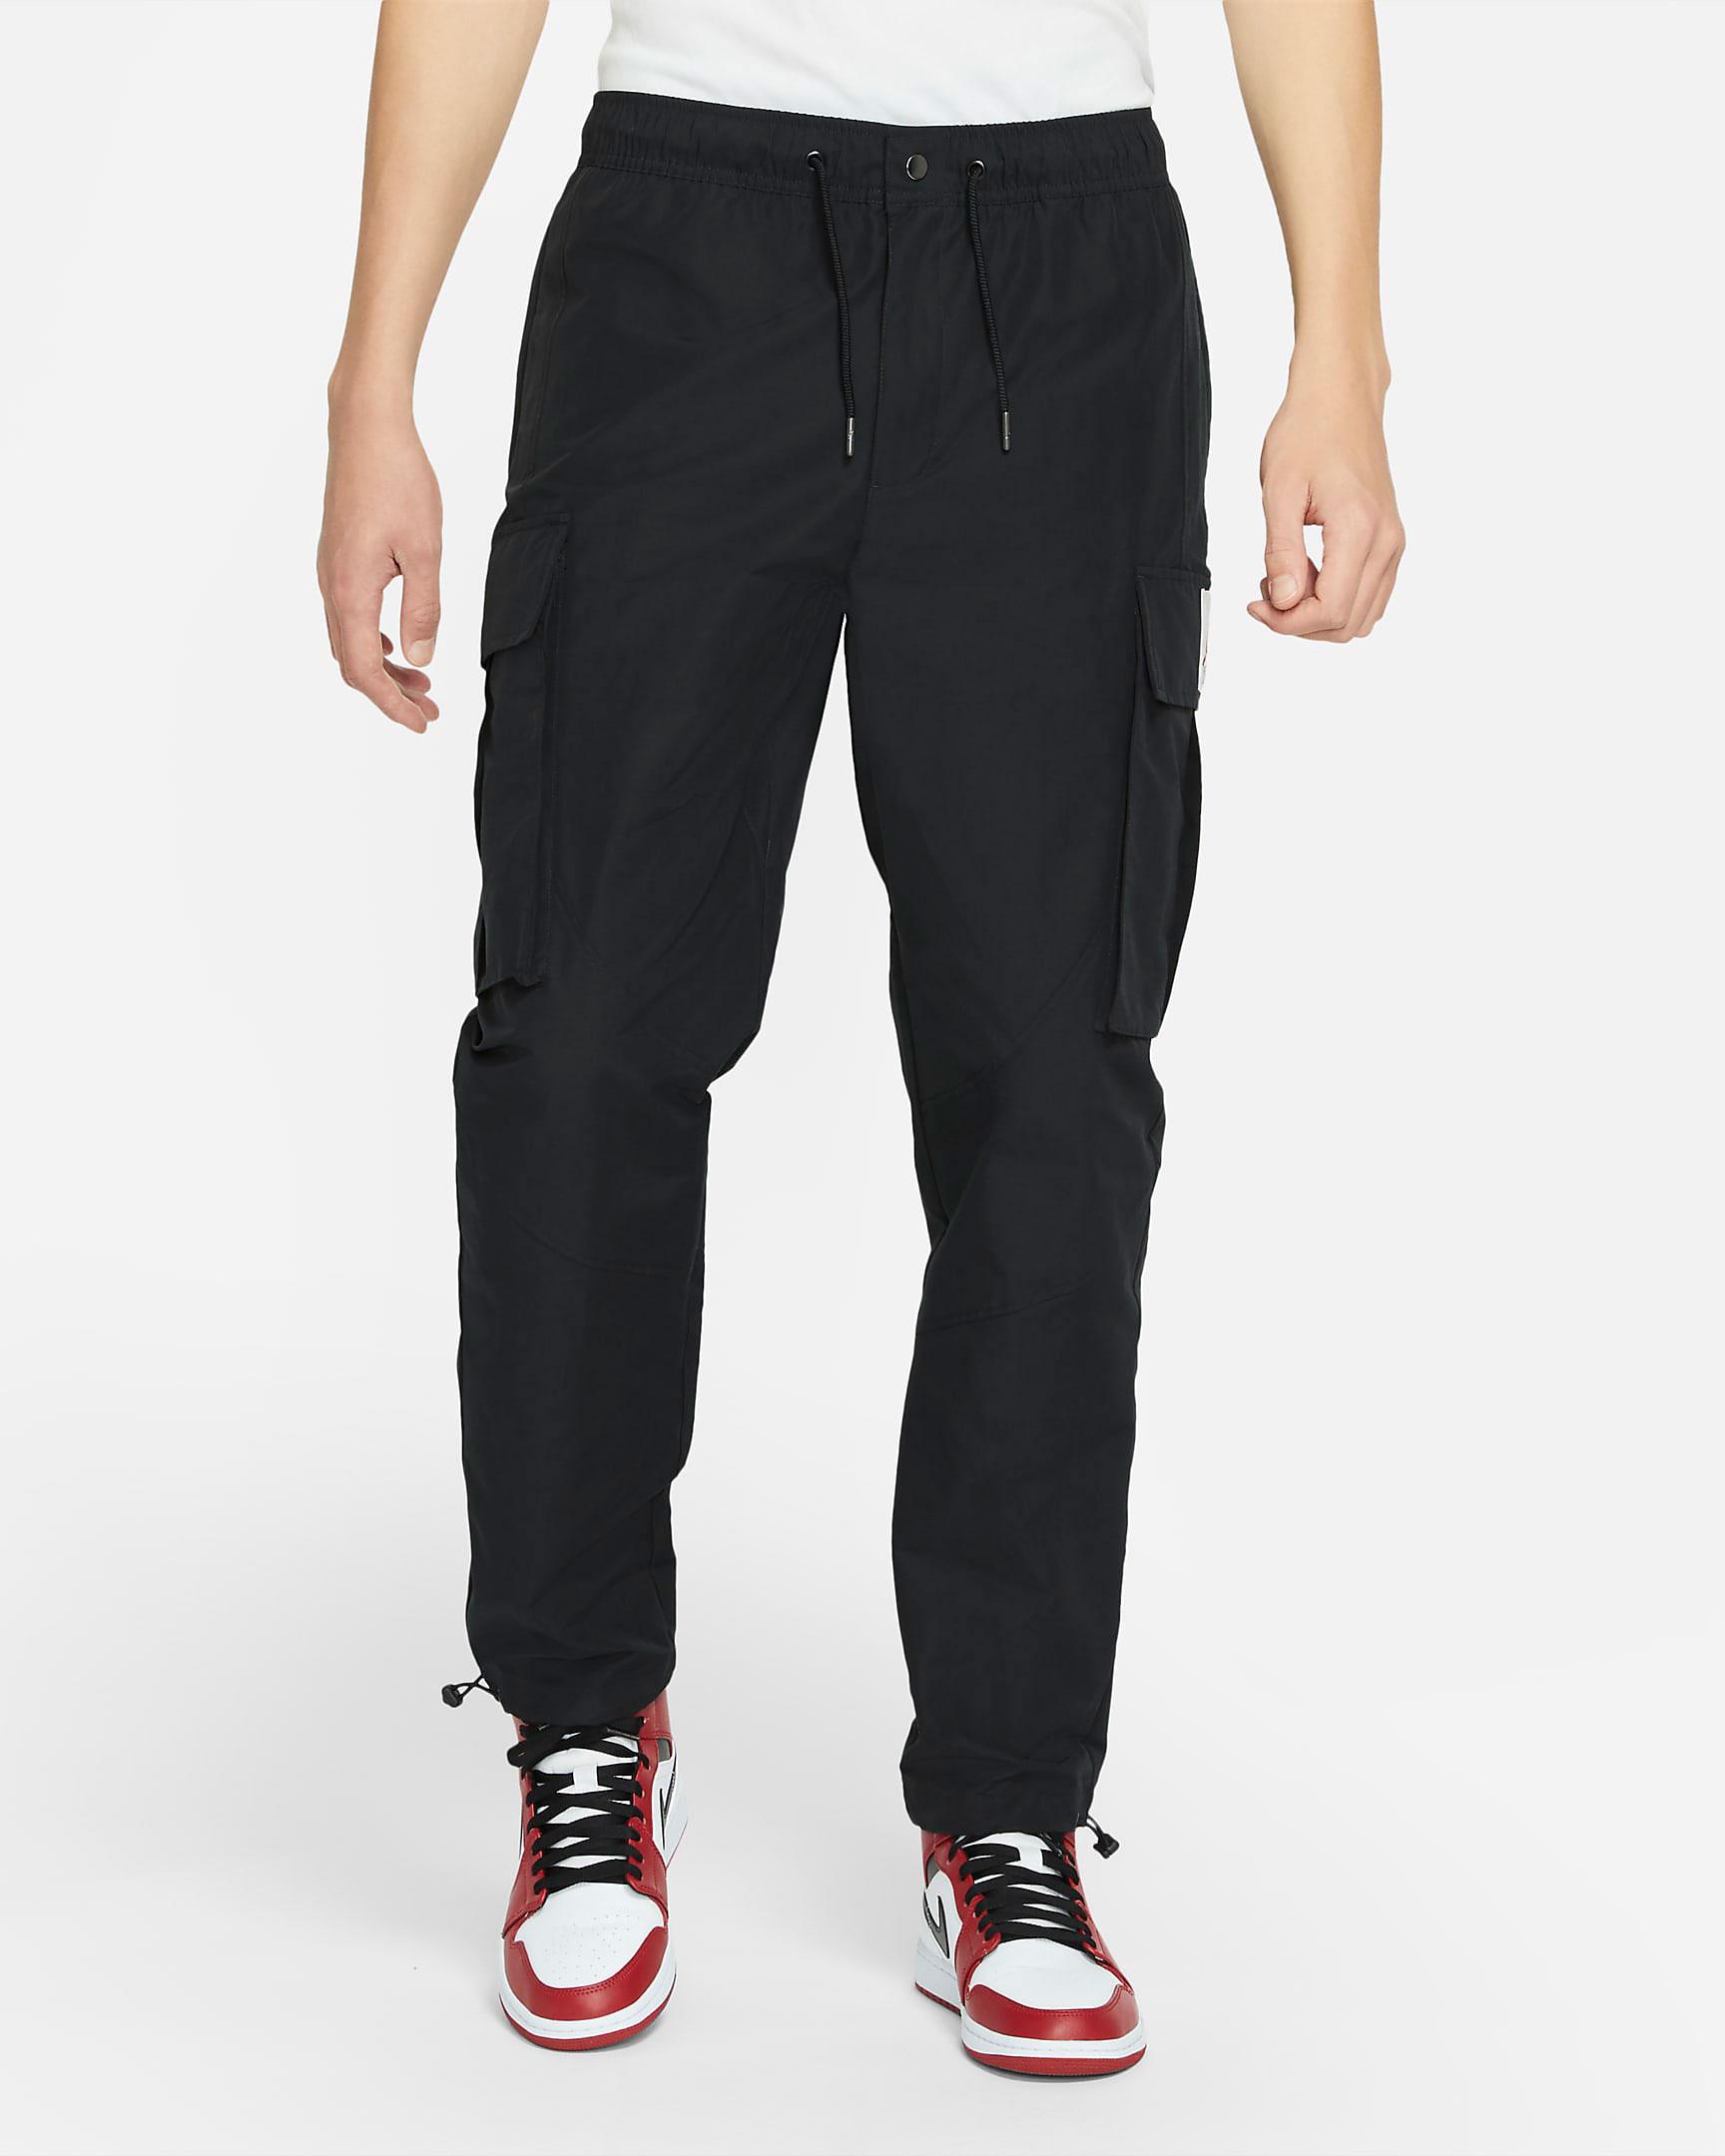 jordan-flight-cargo-pants-black-1